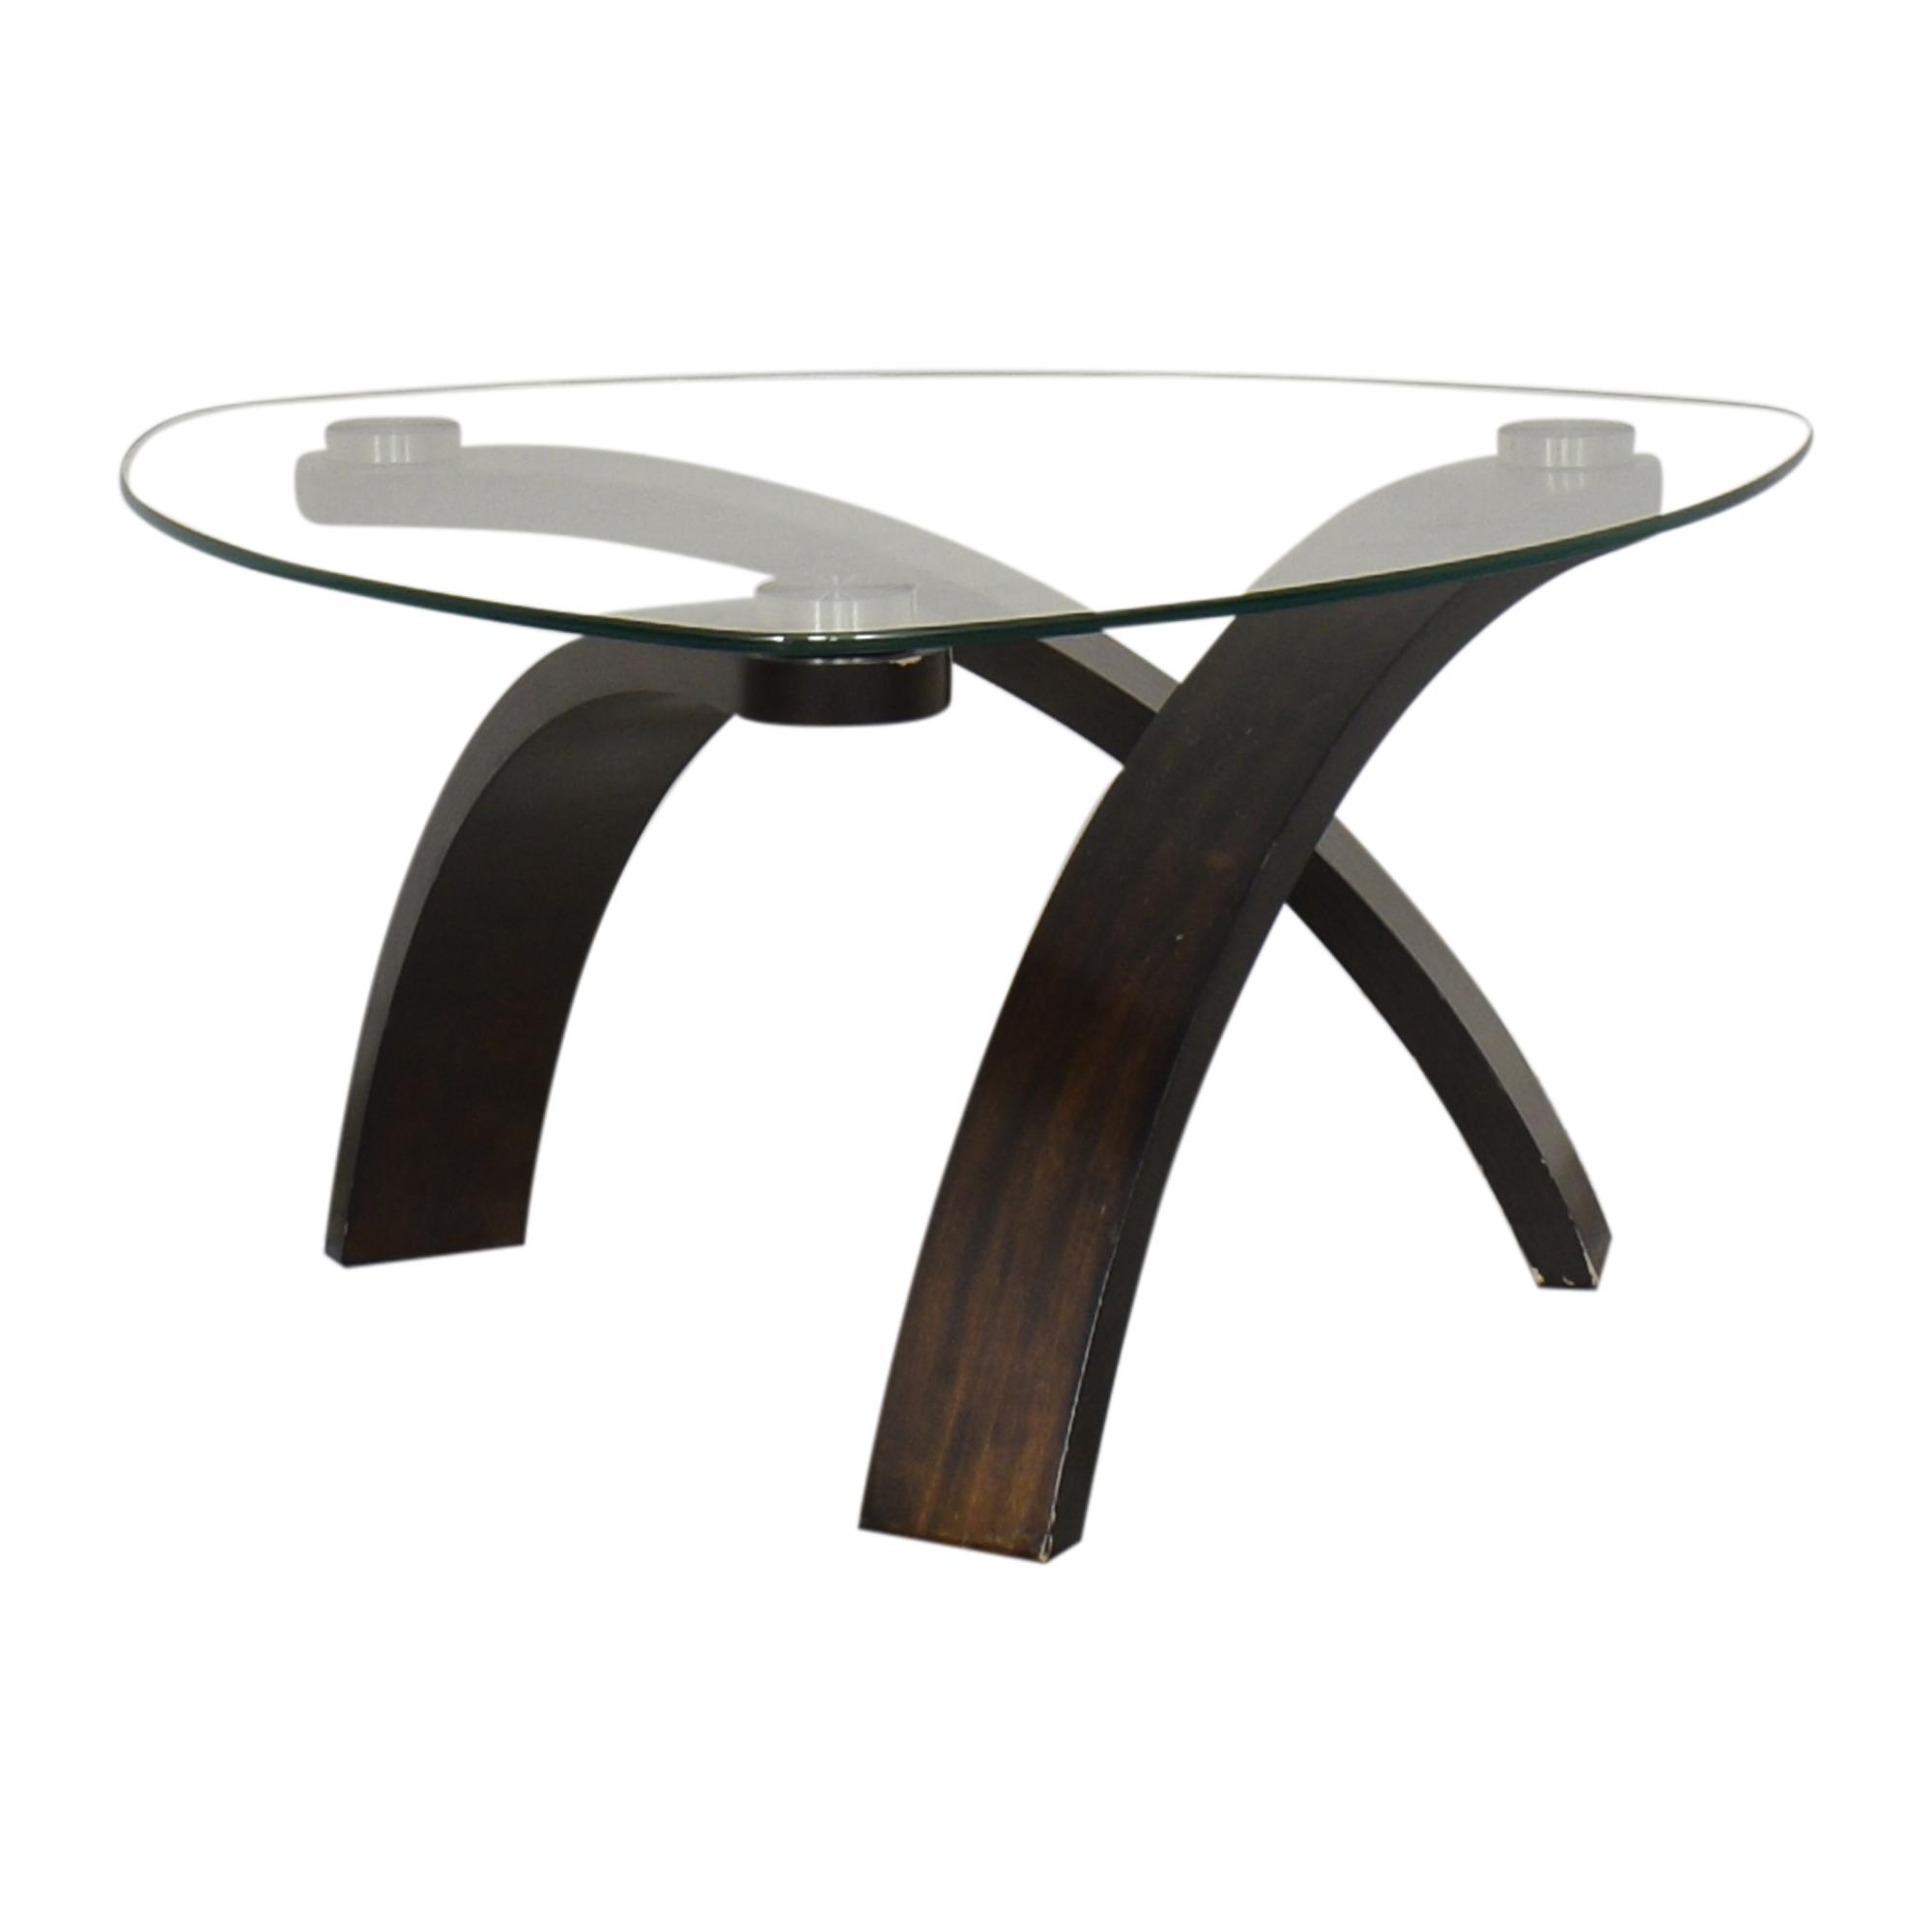 Raymour & Flanigan Raymour & Flanigan Allure Round Coffee Table price